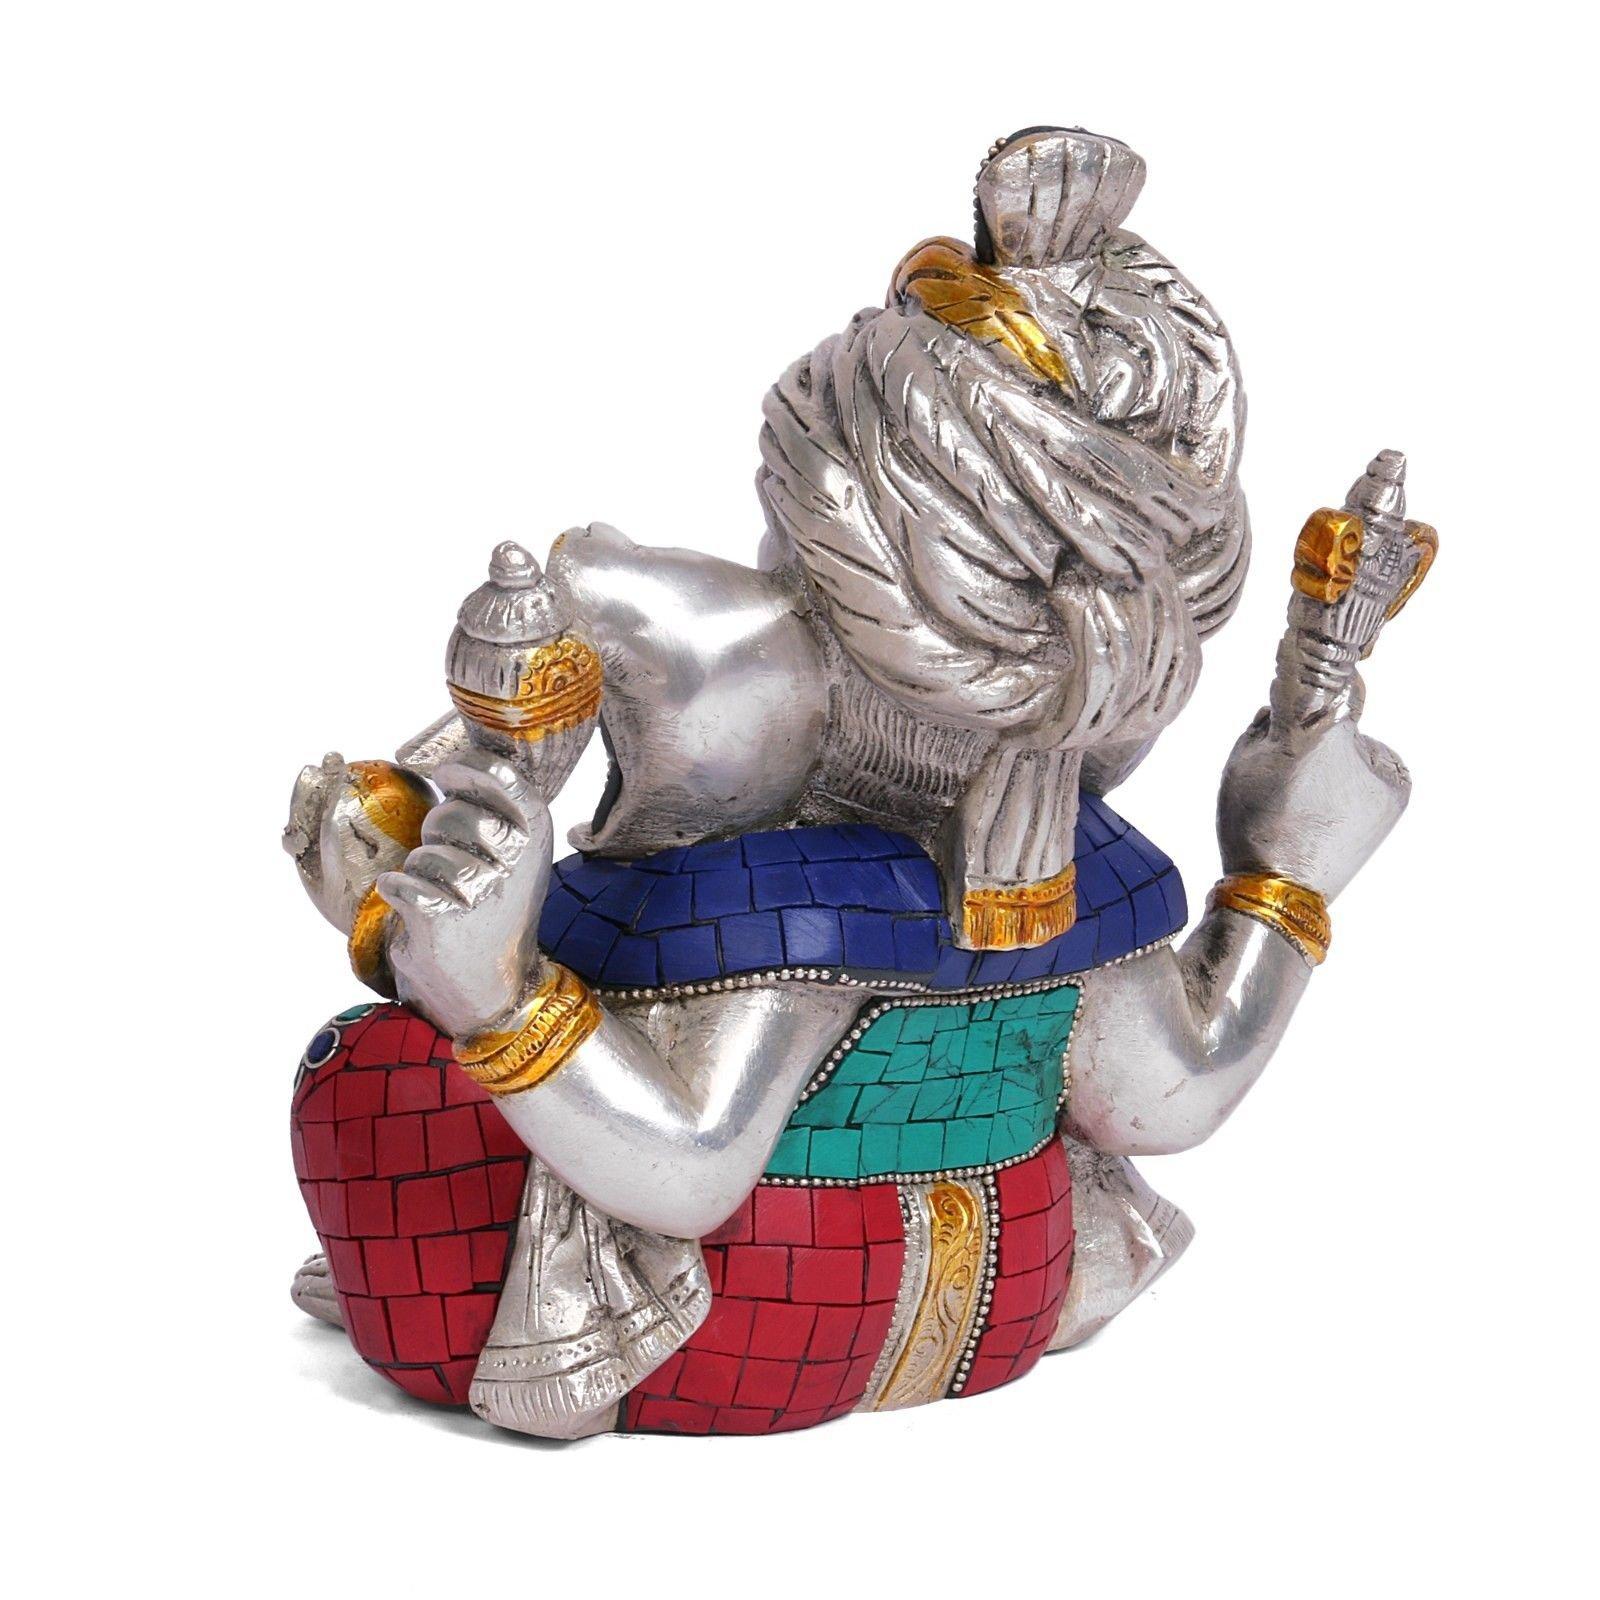 Safa Ganesh Statue Hindu God Figurine Brass Sculpture Ganesha Idol Home Decor Gift by CraftVatika (Image #3)